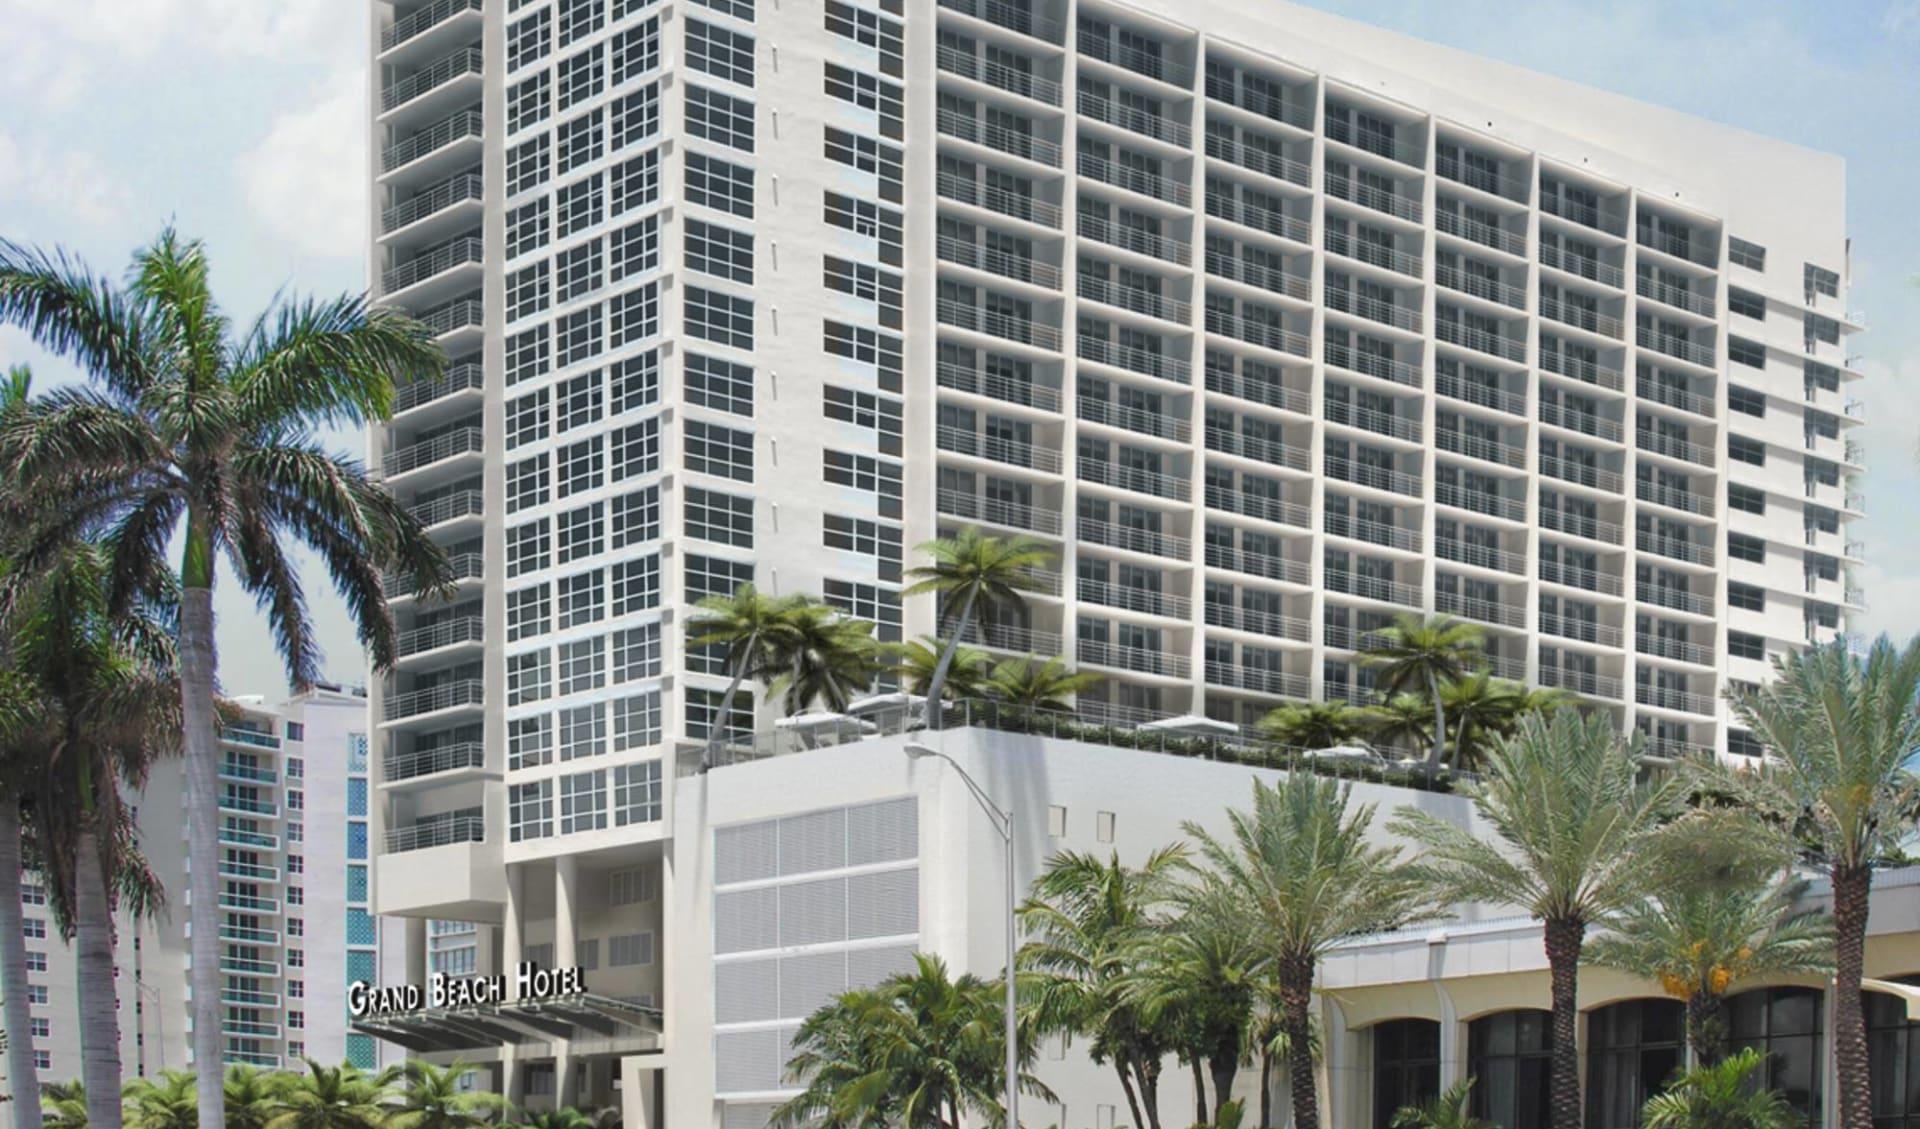 Grand Beach Hotel in Miami Beach:  Grand Beach - Hotelansicht mit Palmen